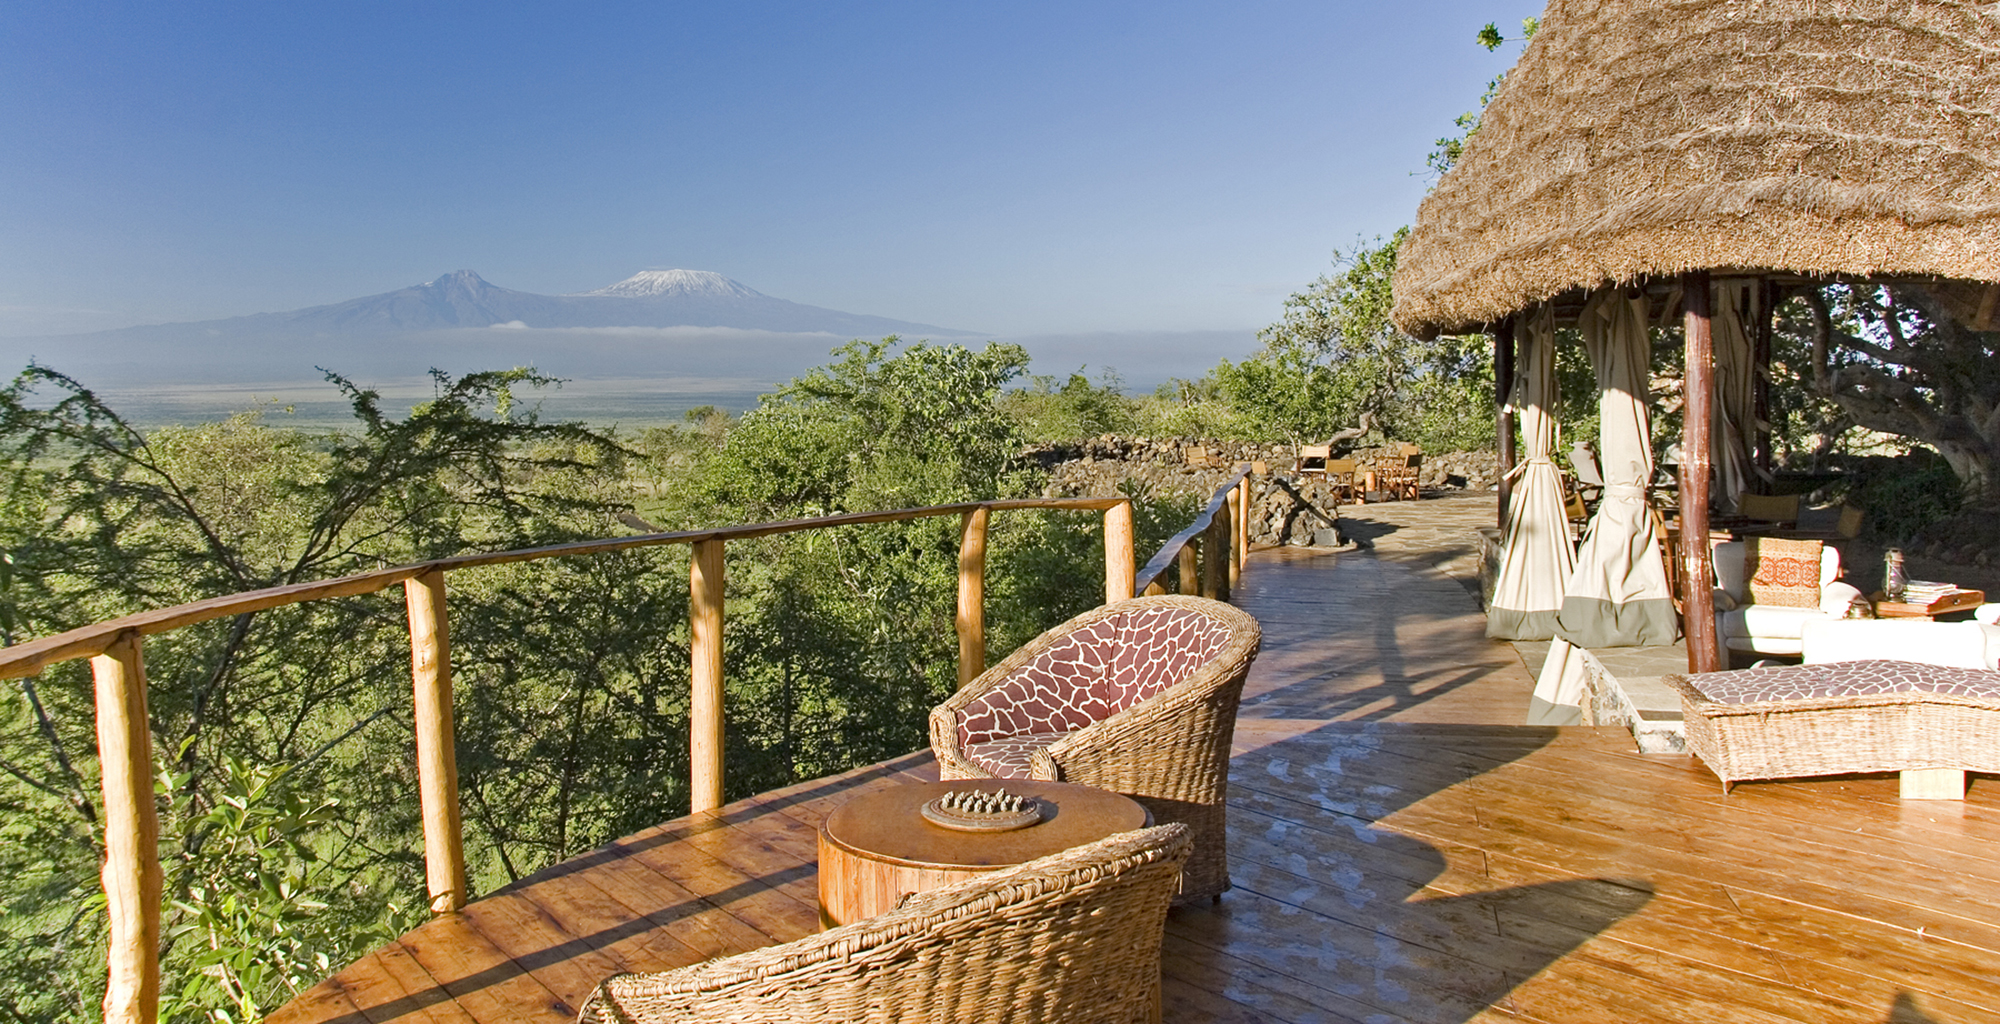 Kenya-Campi-ya-Kanzi-Deck